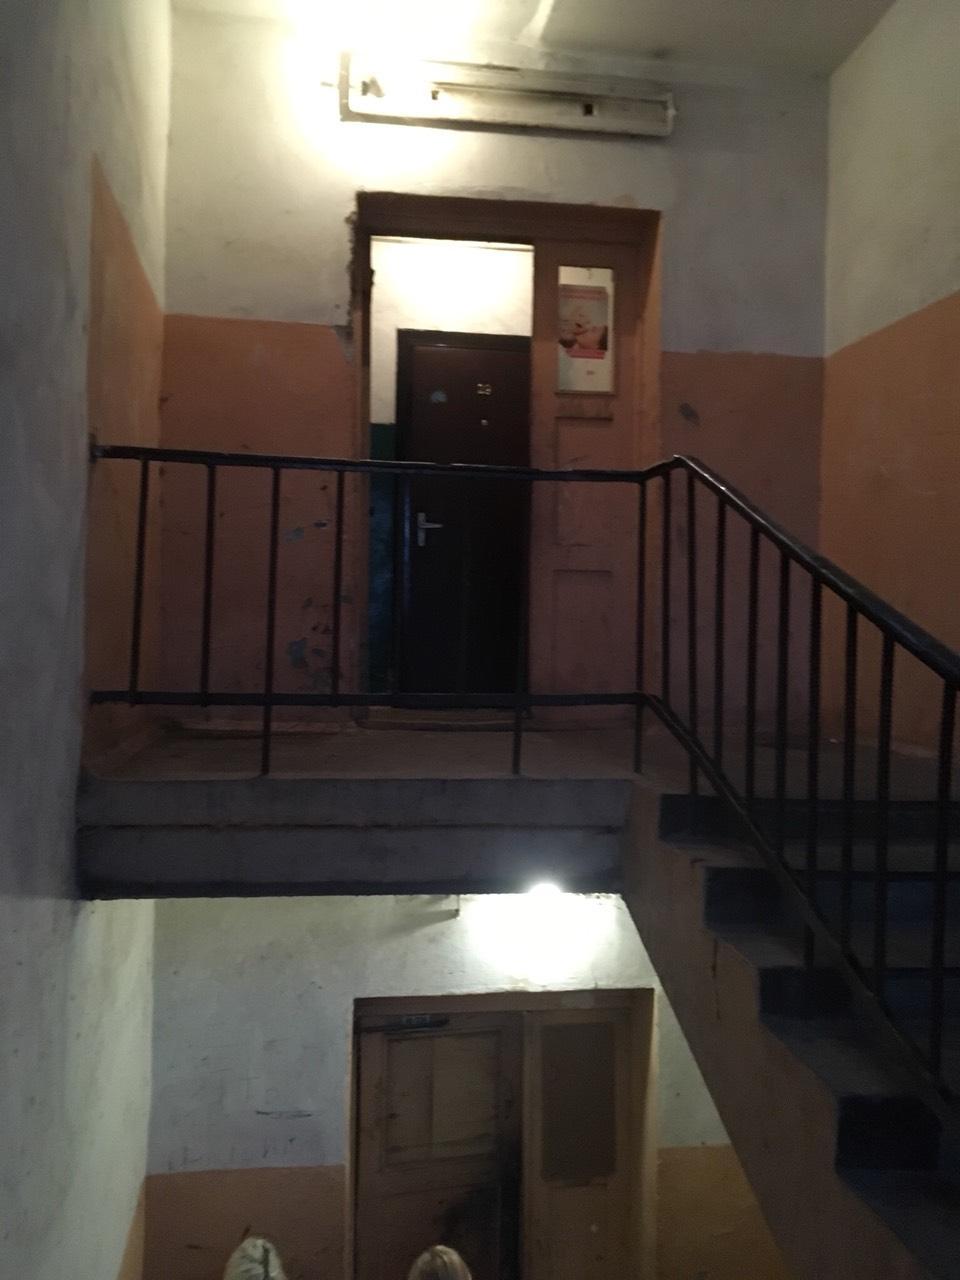 Комната 13,8 кв.м - Ижорского Батальона, д. 10Б